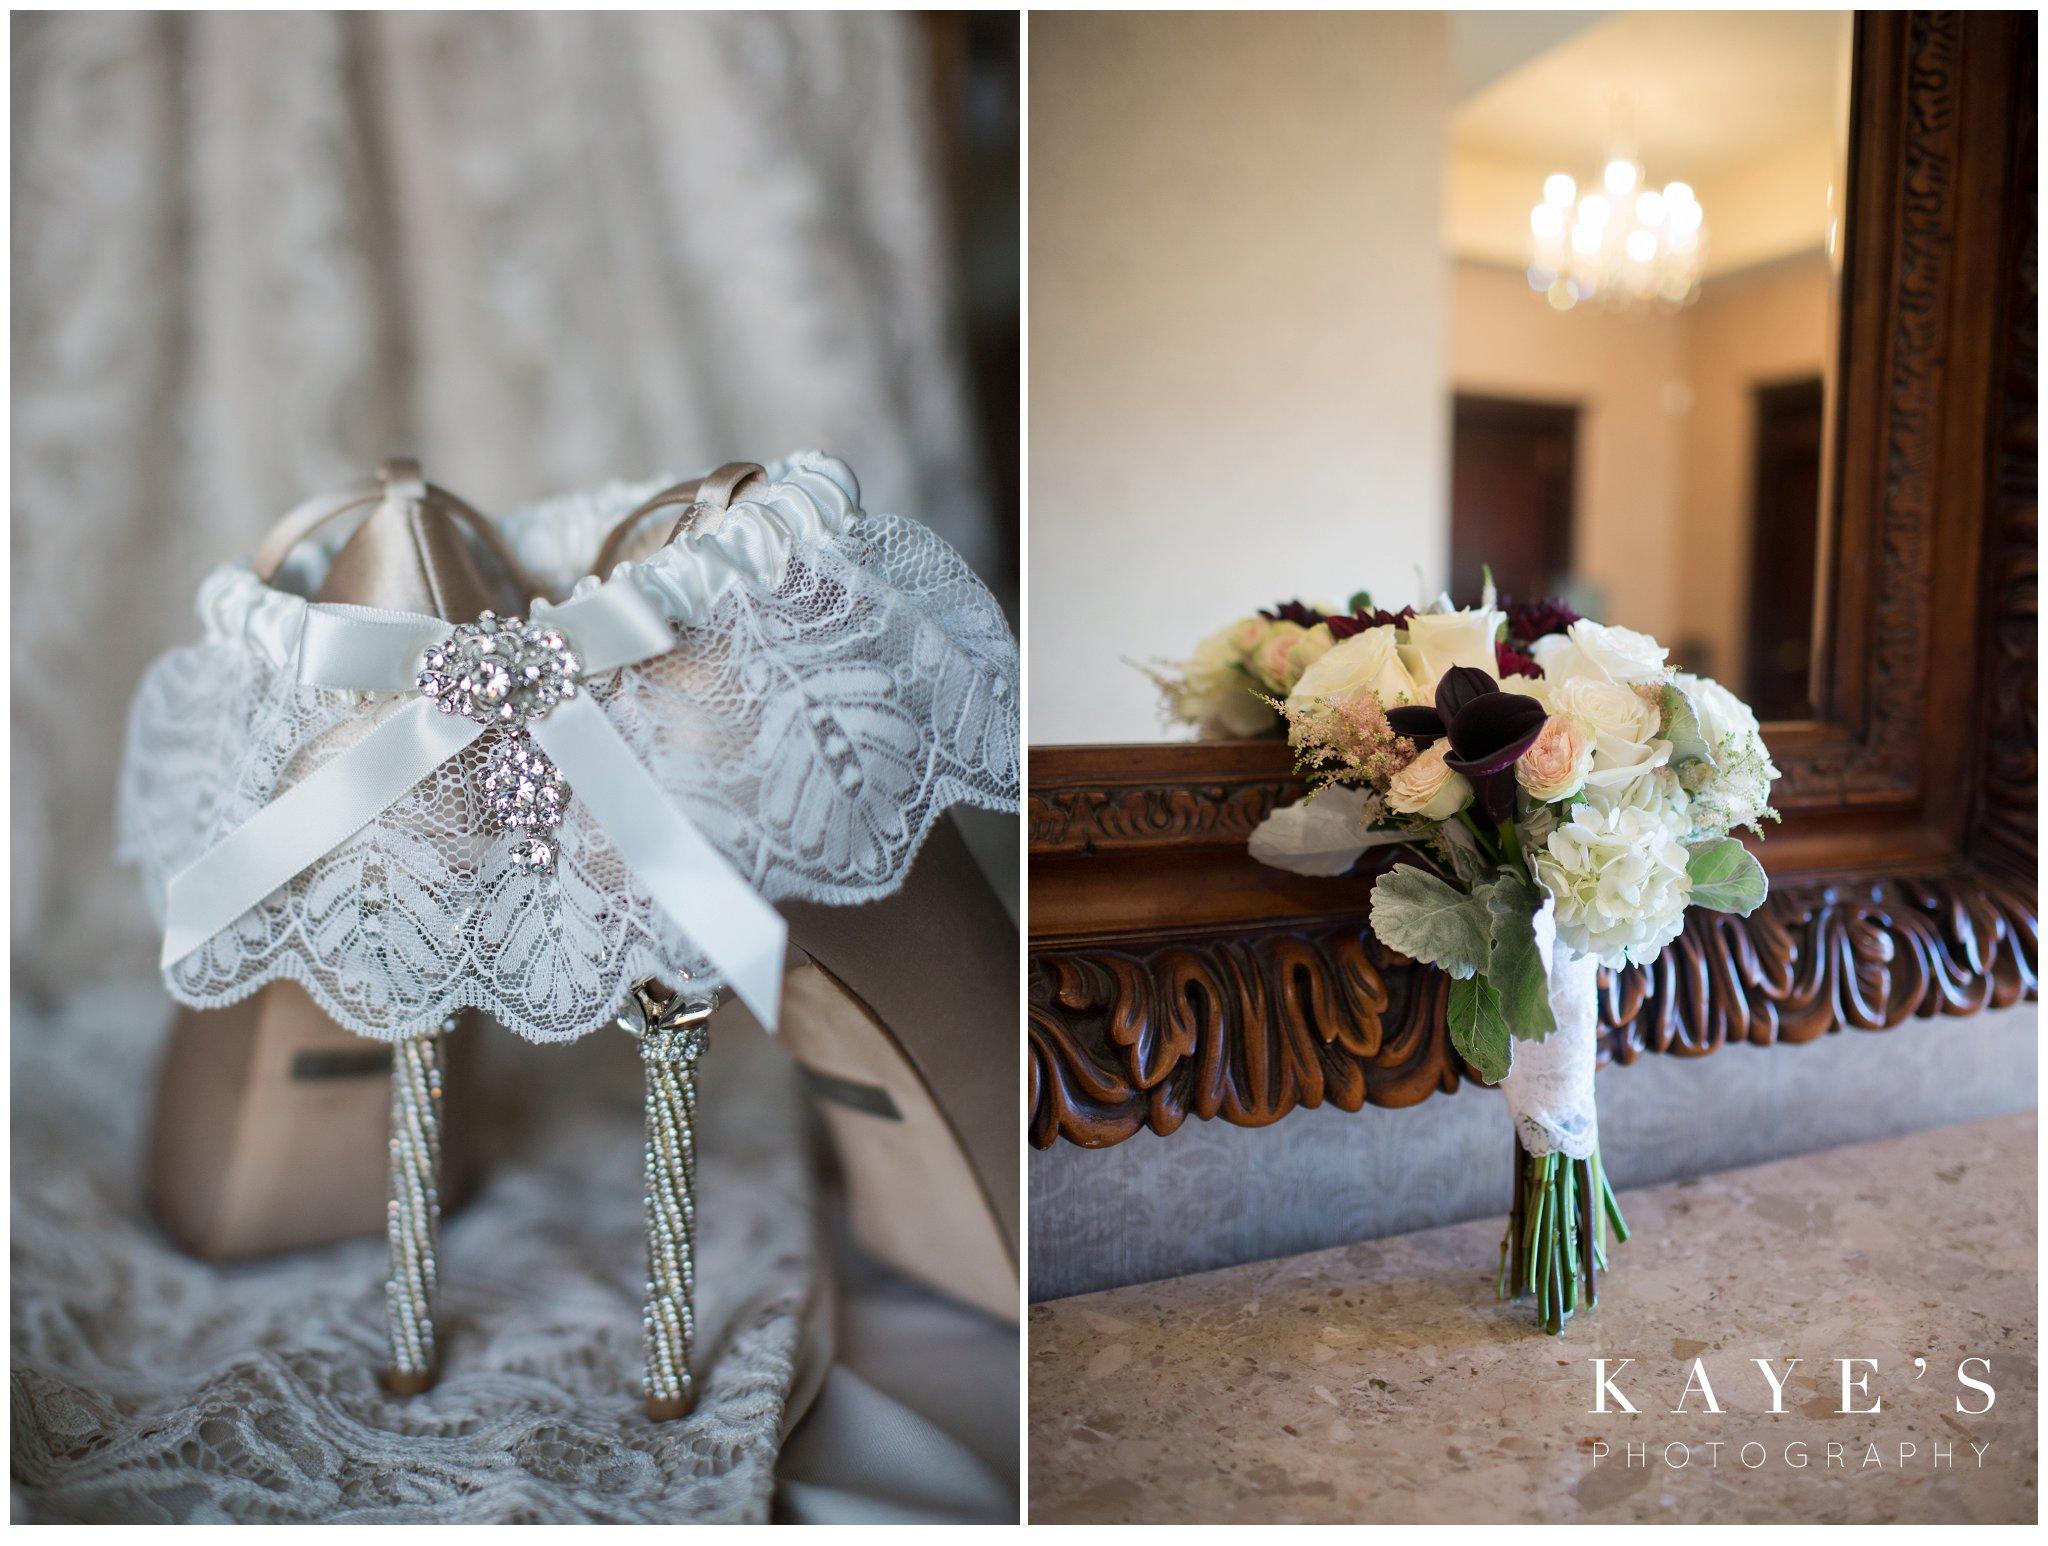 Kayes Photography- howell-michigan-wedding-photographer_0635.jpg